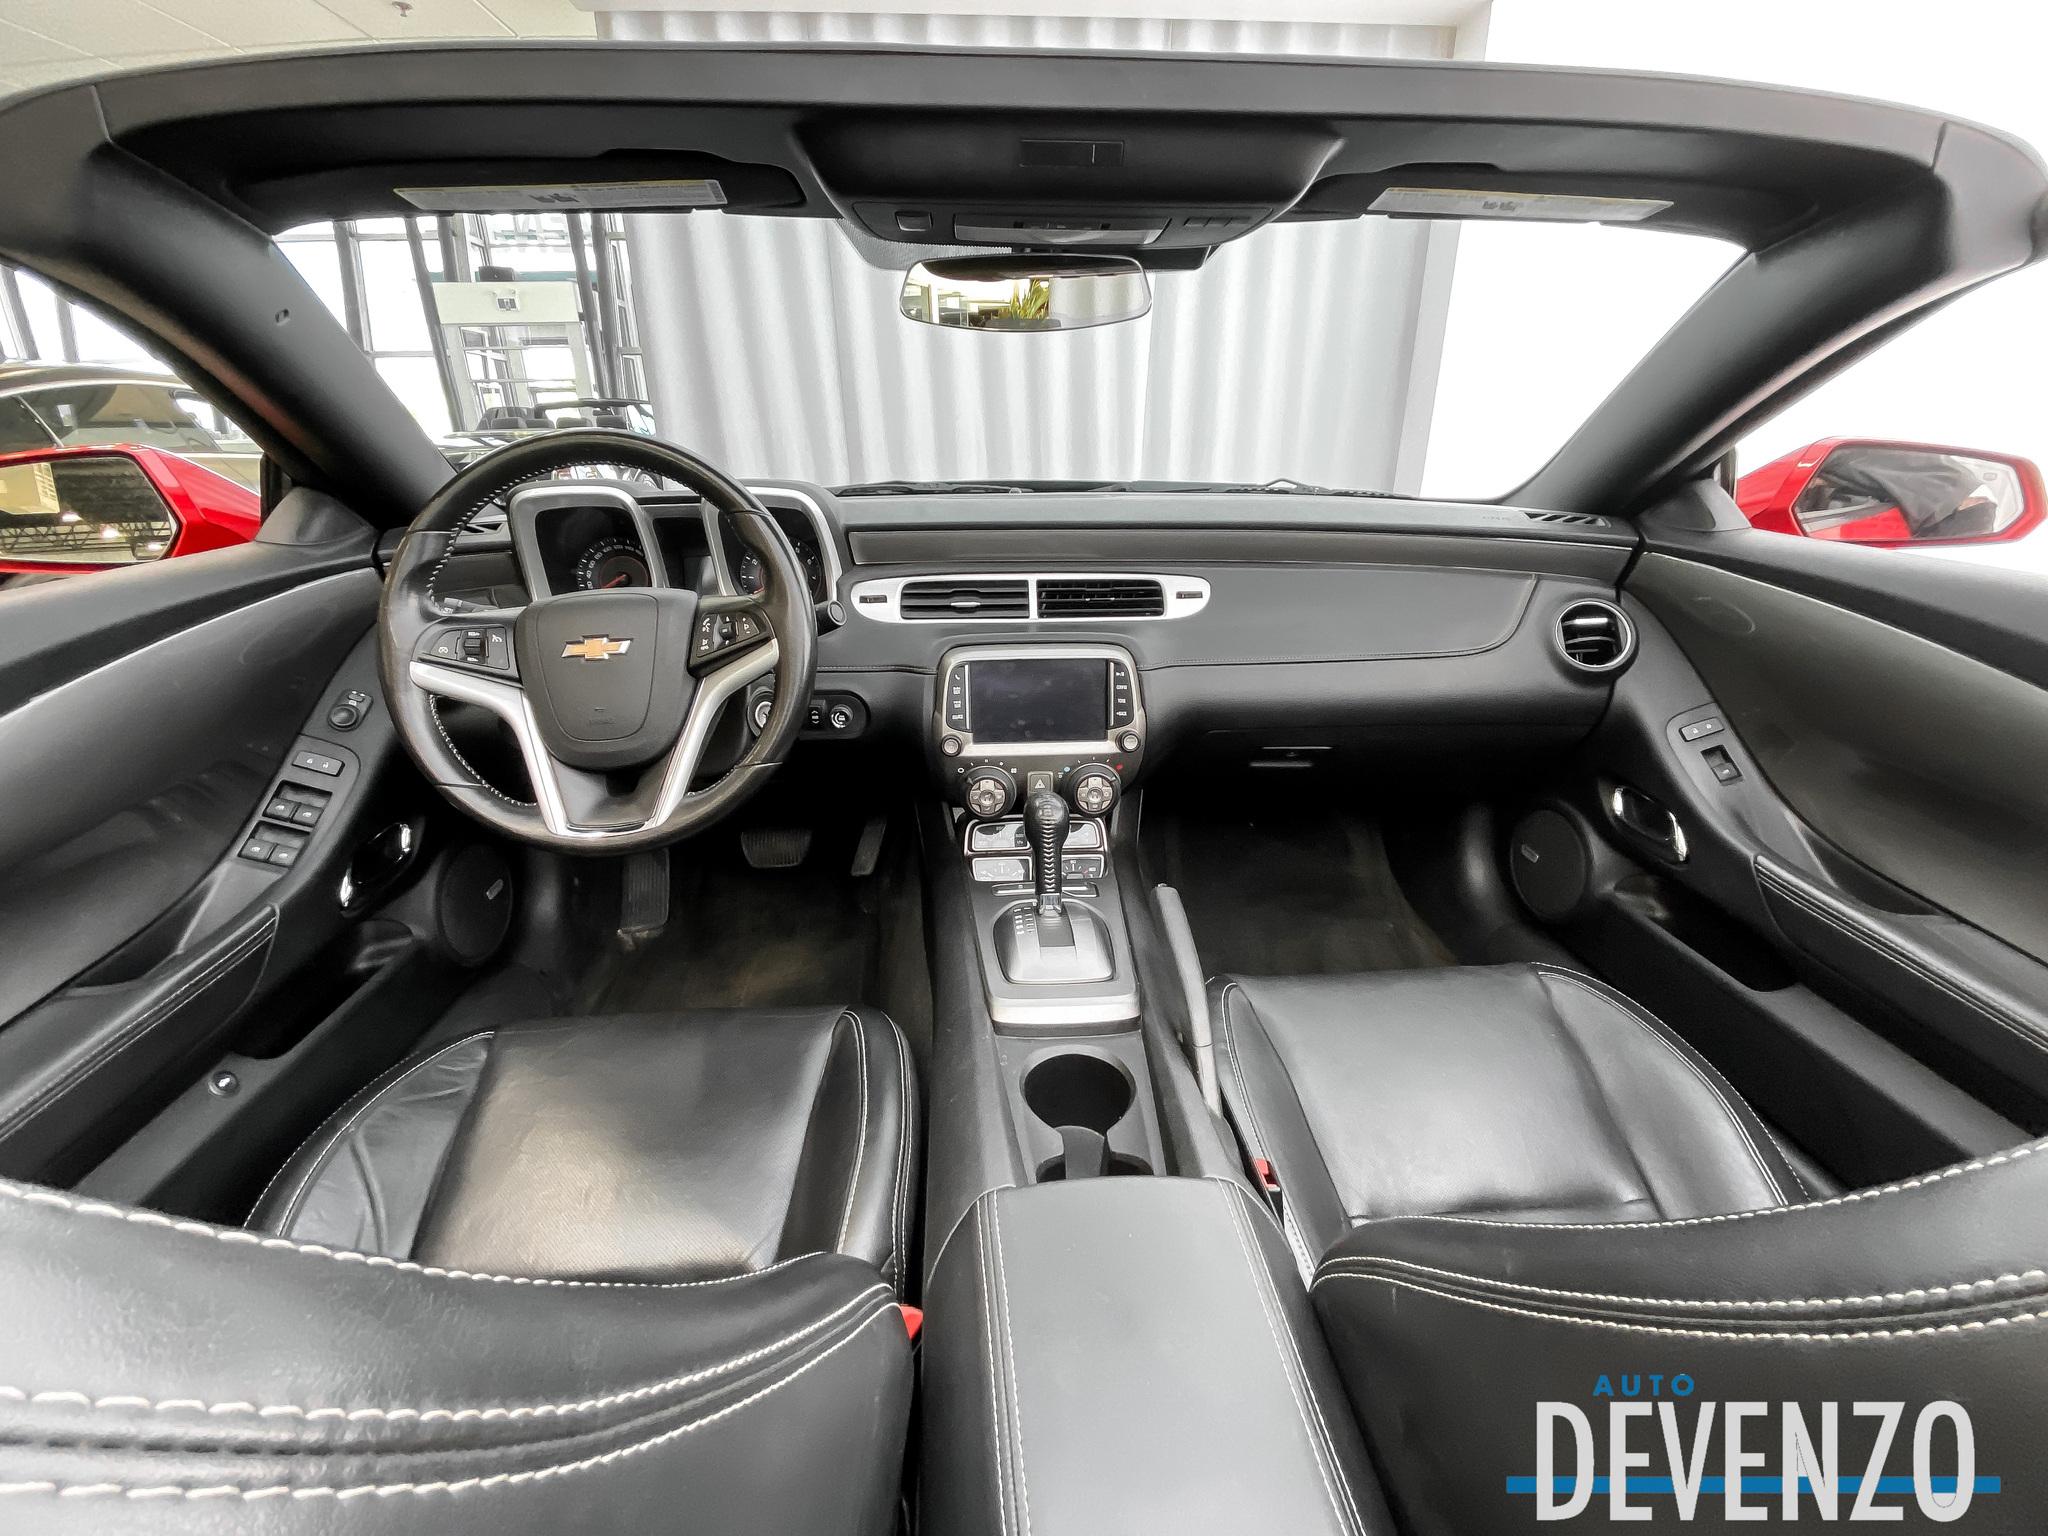 2013 Chevrolet Camaro RS 2LT CONVERTIBLE BLACK TRIM complet